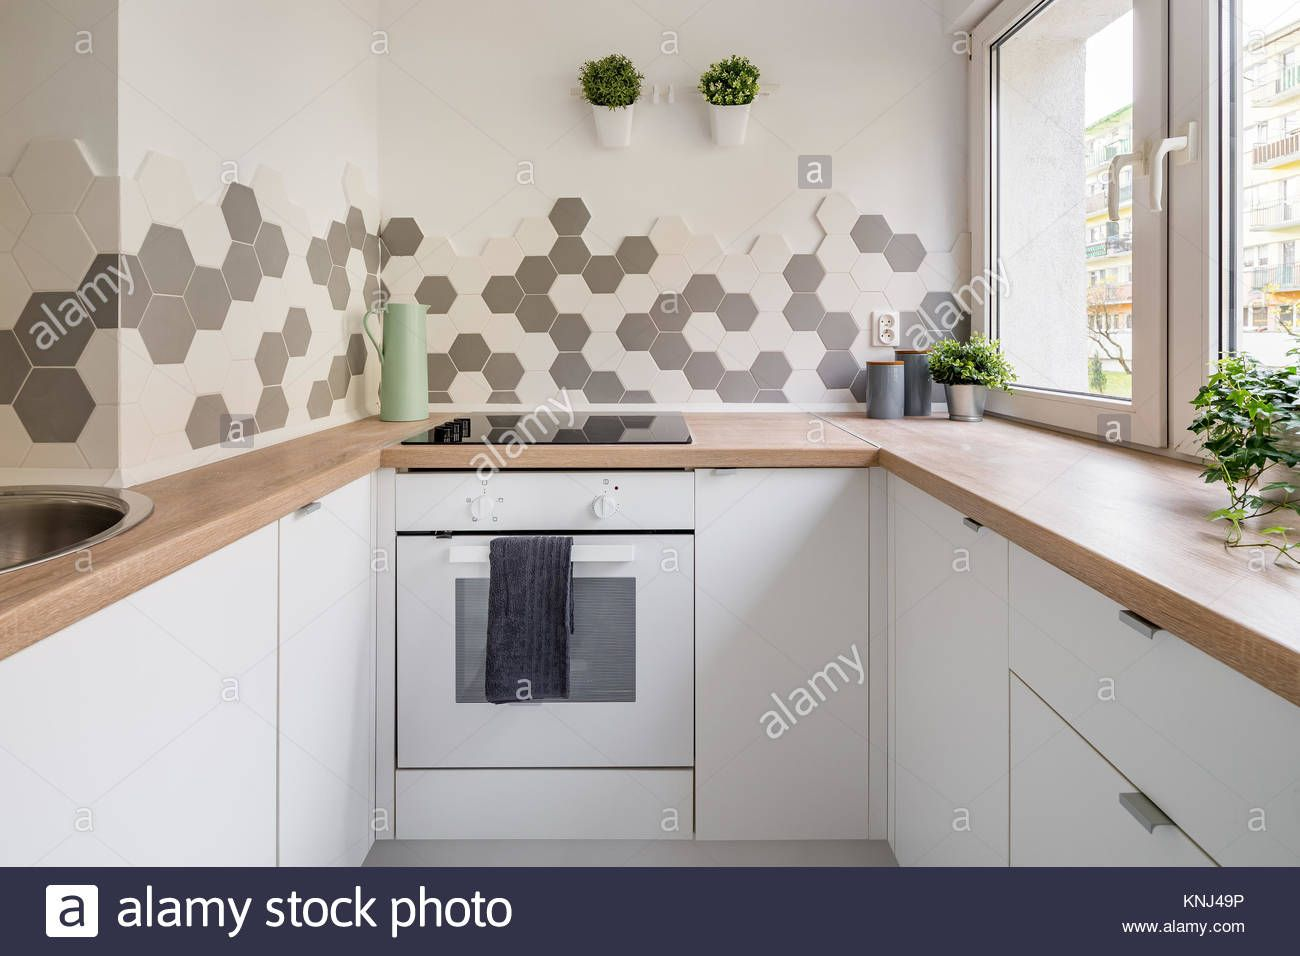 Kitchen In Scandinavian Style With White Cabinets Wooden Countertop And Hex Kitchen Backsplash Tile Designs Unique Kitchen Backsplash Kitchen Tiles Backsplash